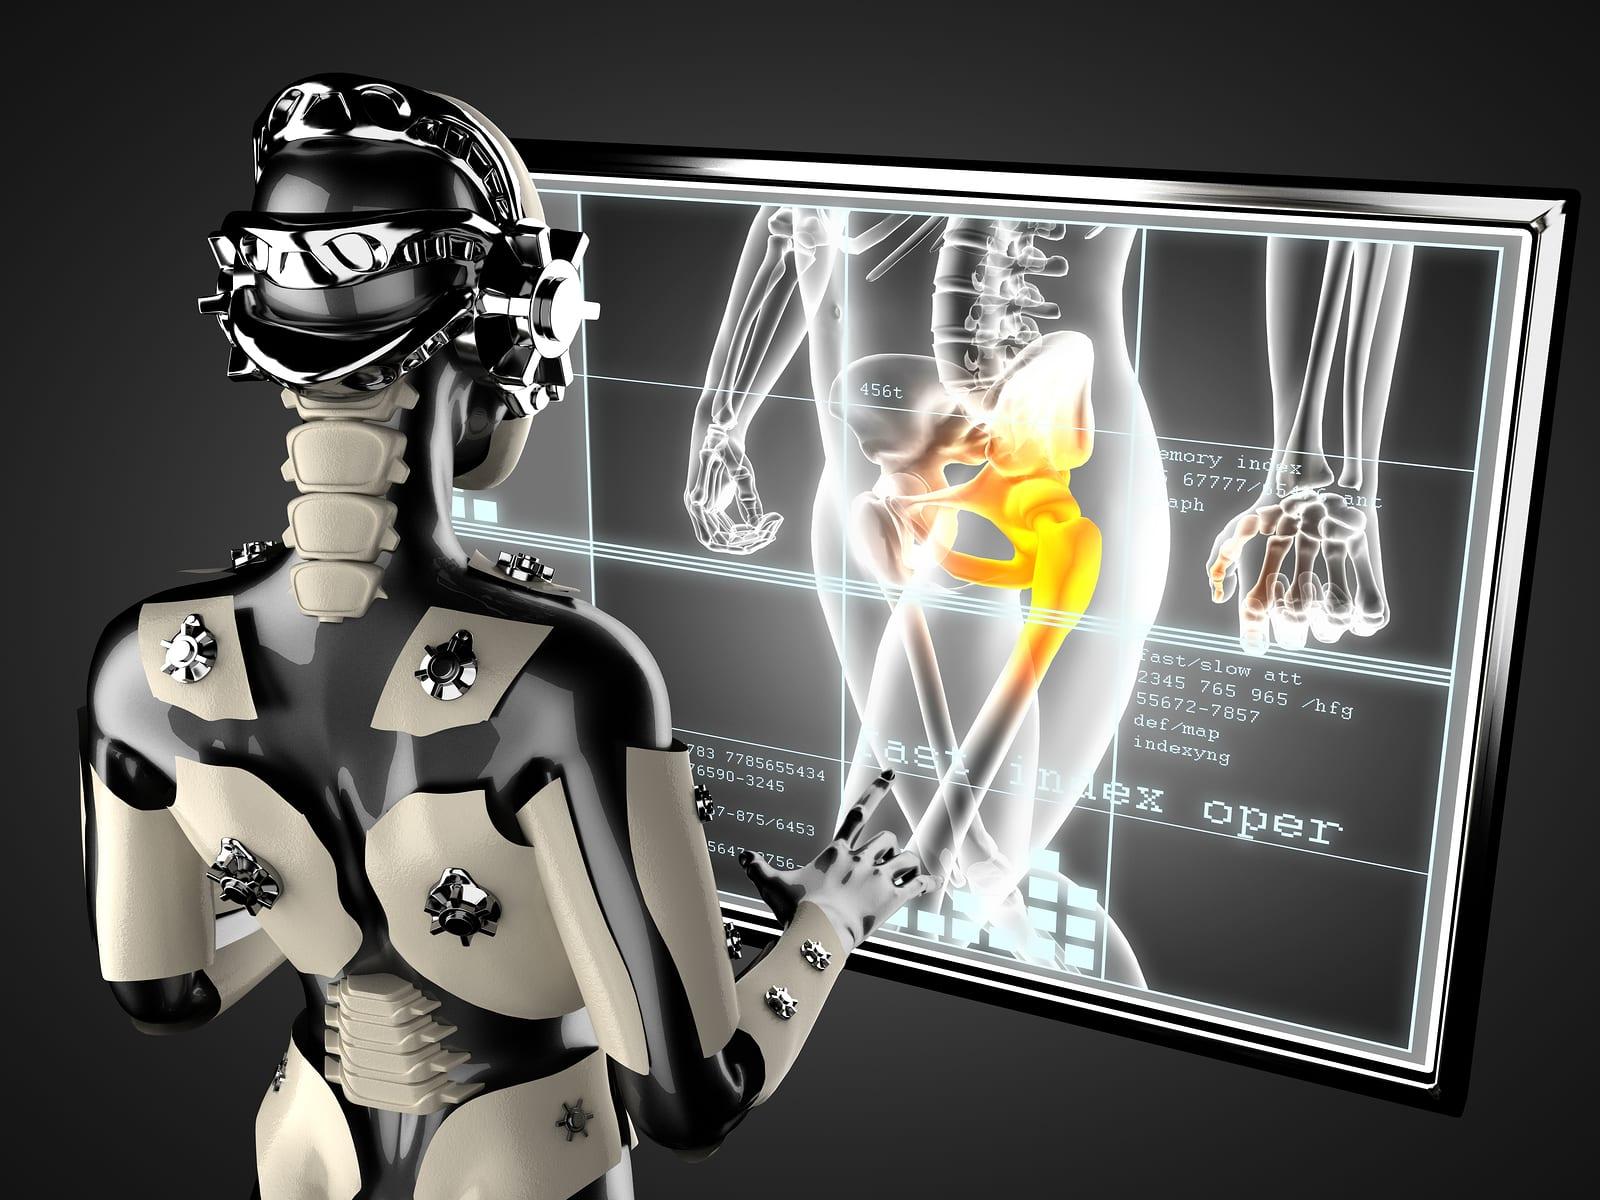 9 Artificial Intelligence Startups In Medical Imaging